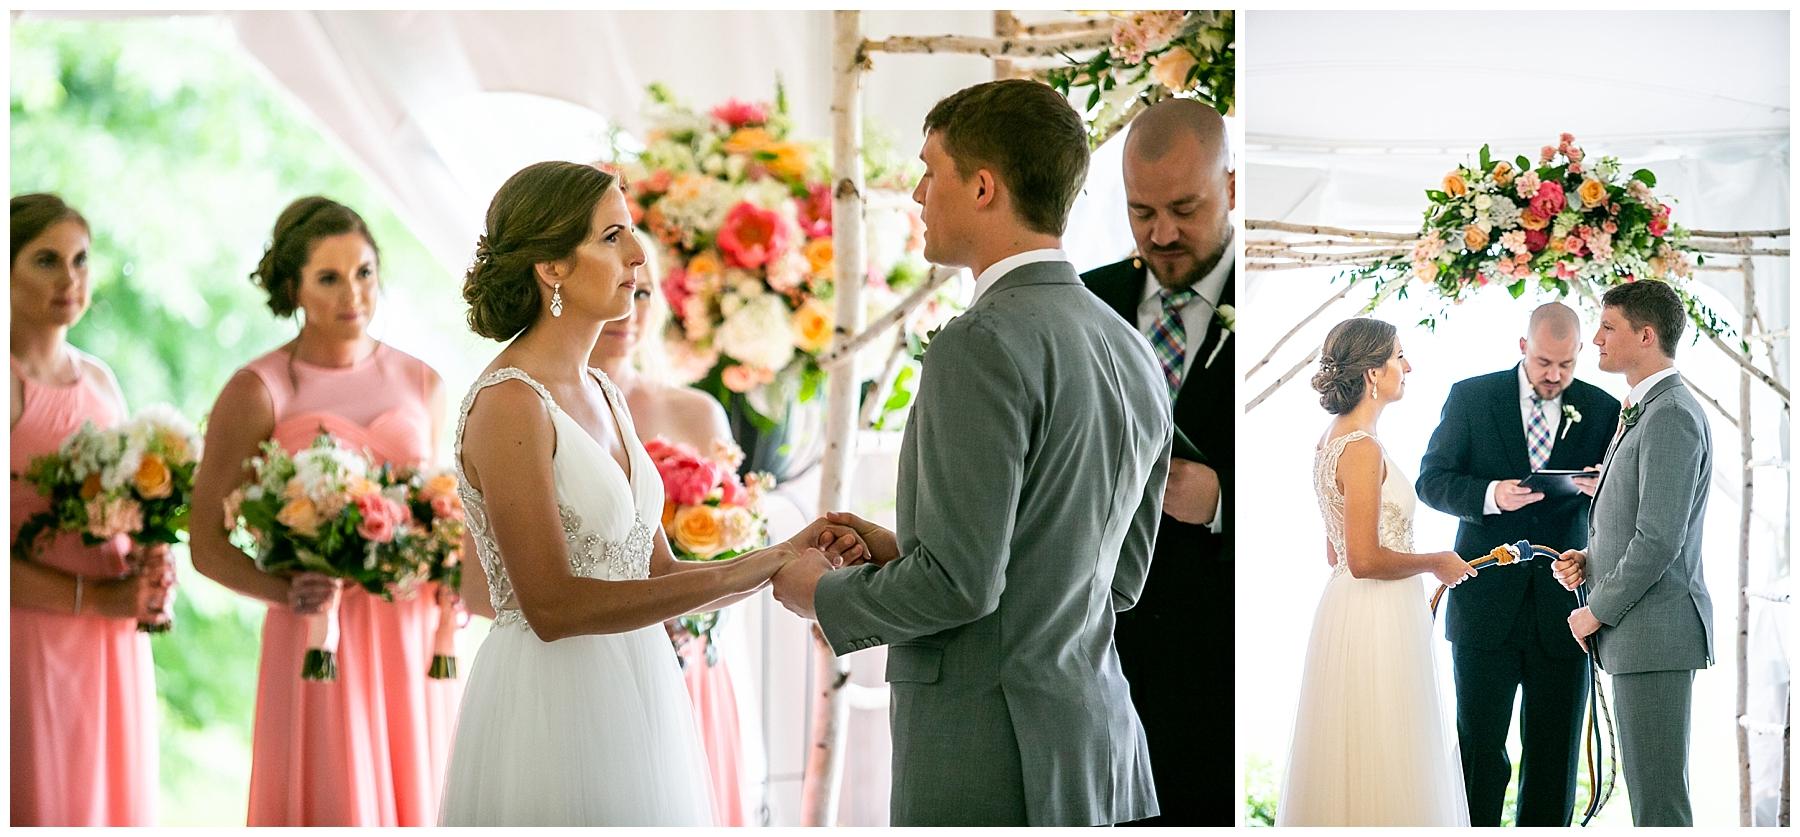 Chelsea Phil Bohemia River Overlook Wedding Living Radiant Photography photos_0111.jpg